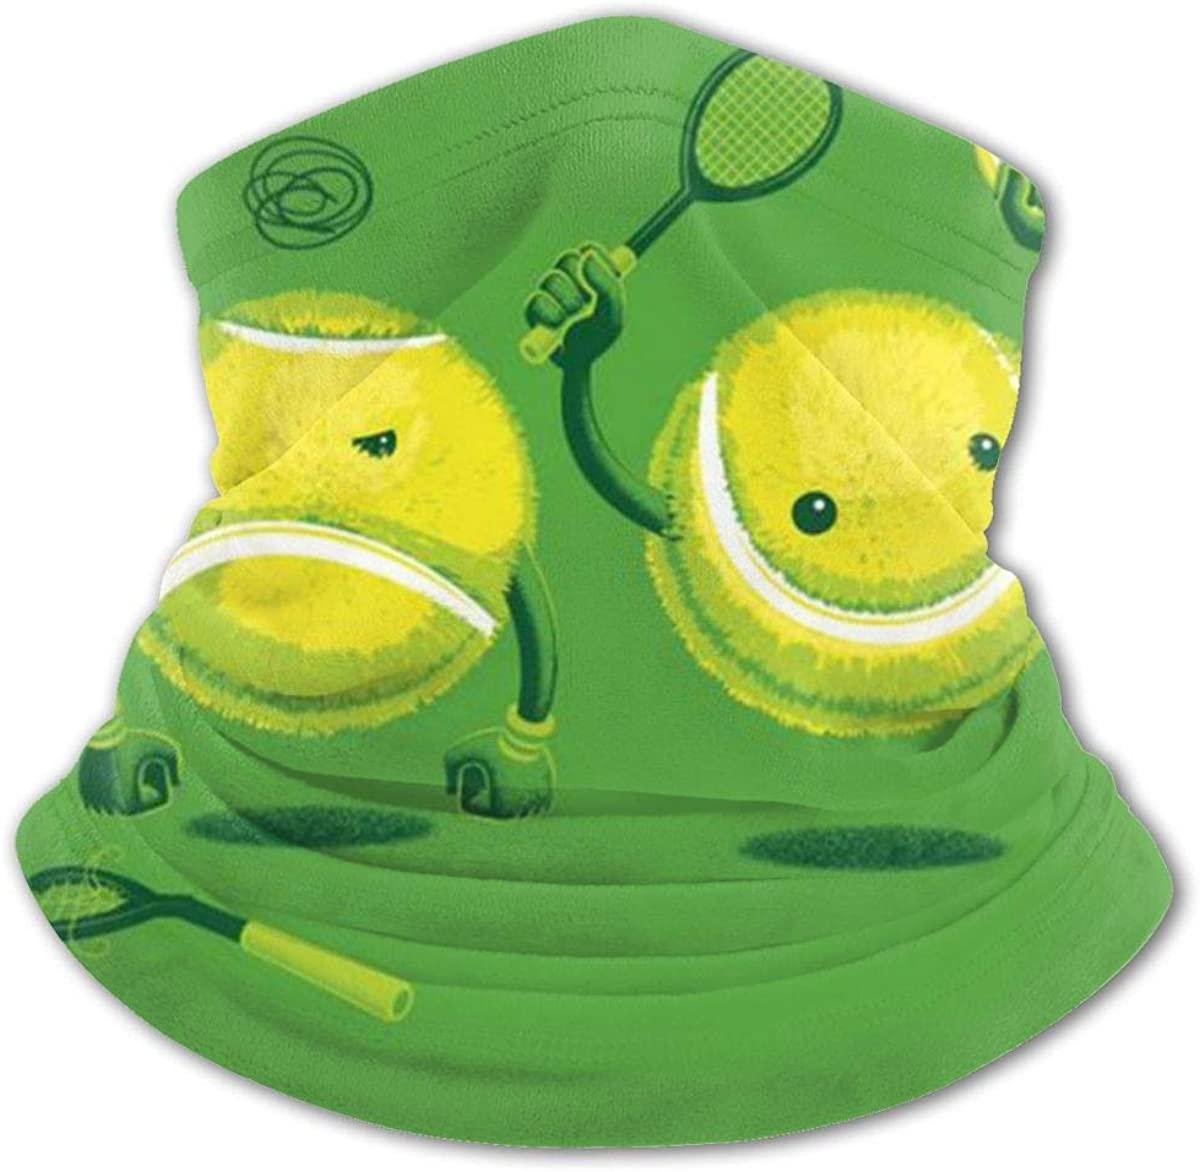 Baseball Ball Headwear For Girls And Boys, Head Wrap, Neck Gaiter, Headband, Tenn Fishing Mask, Magic Scarf, Tube Mask, Face Bandana Mask For Camping Running Cycling